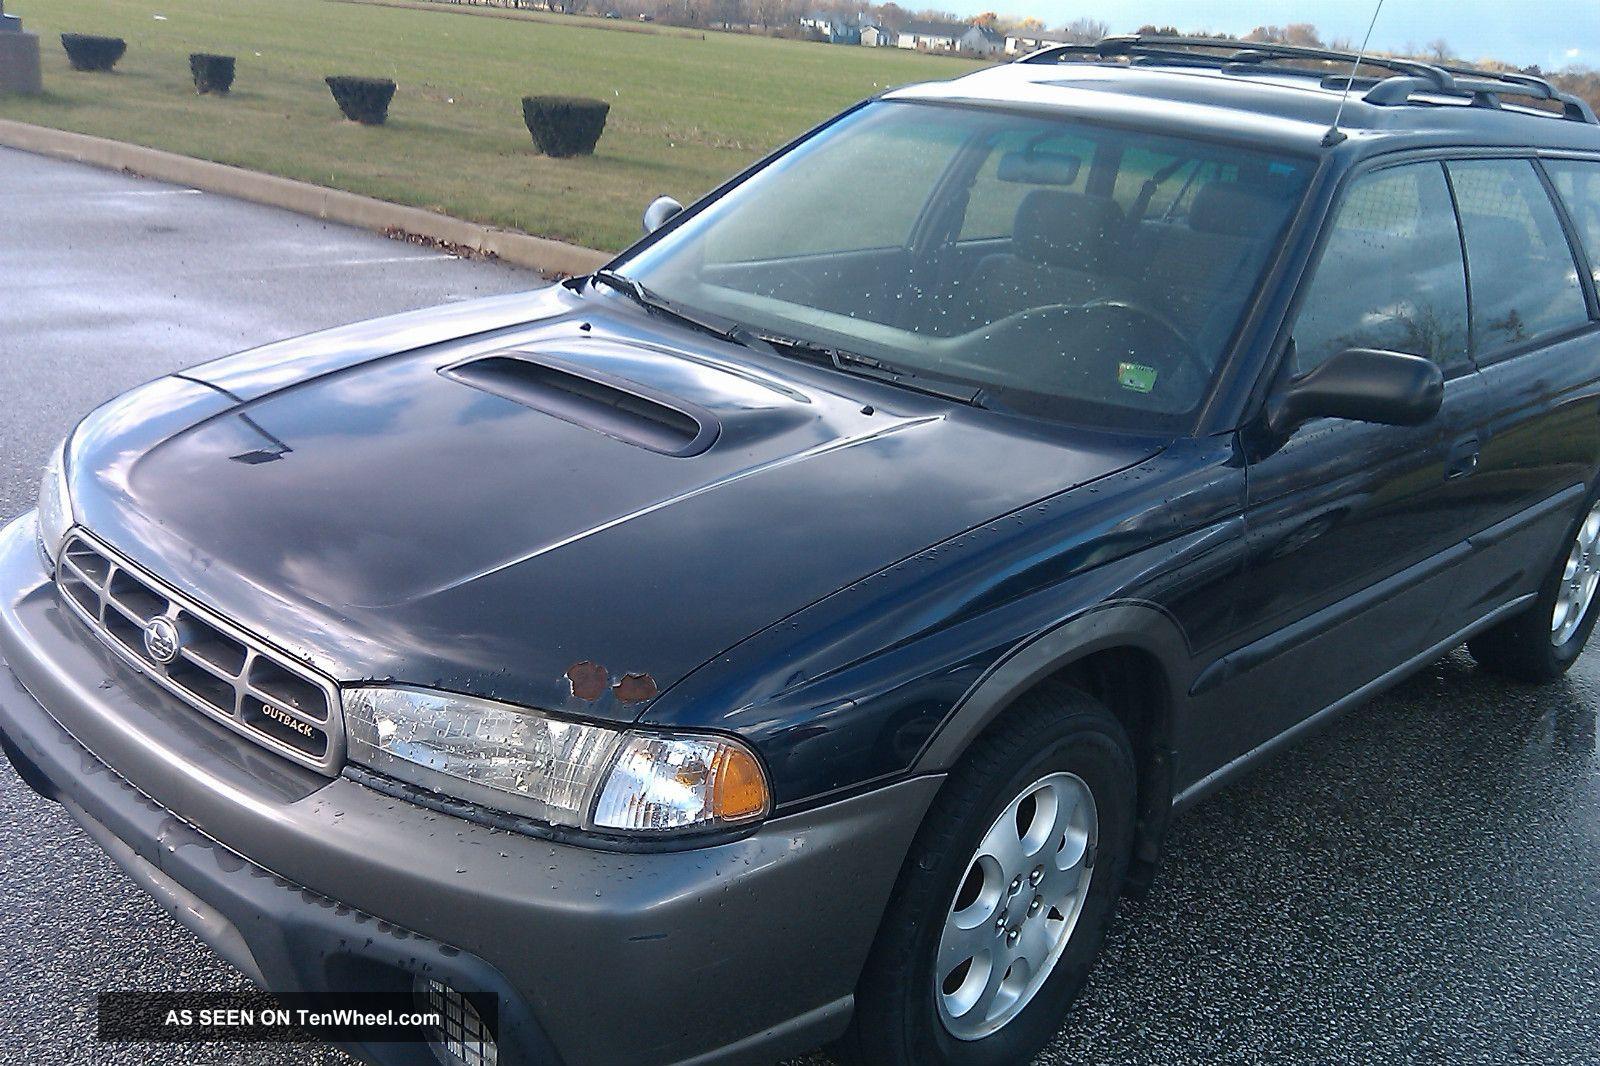 1999 Subaru Legacy Outback Wagon 4 Door 2 0 Turbo Not Running